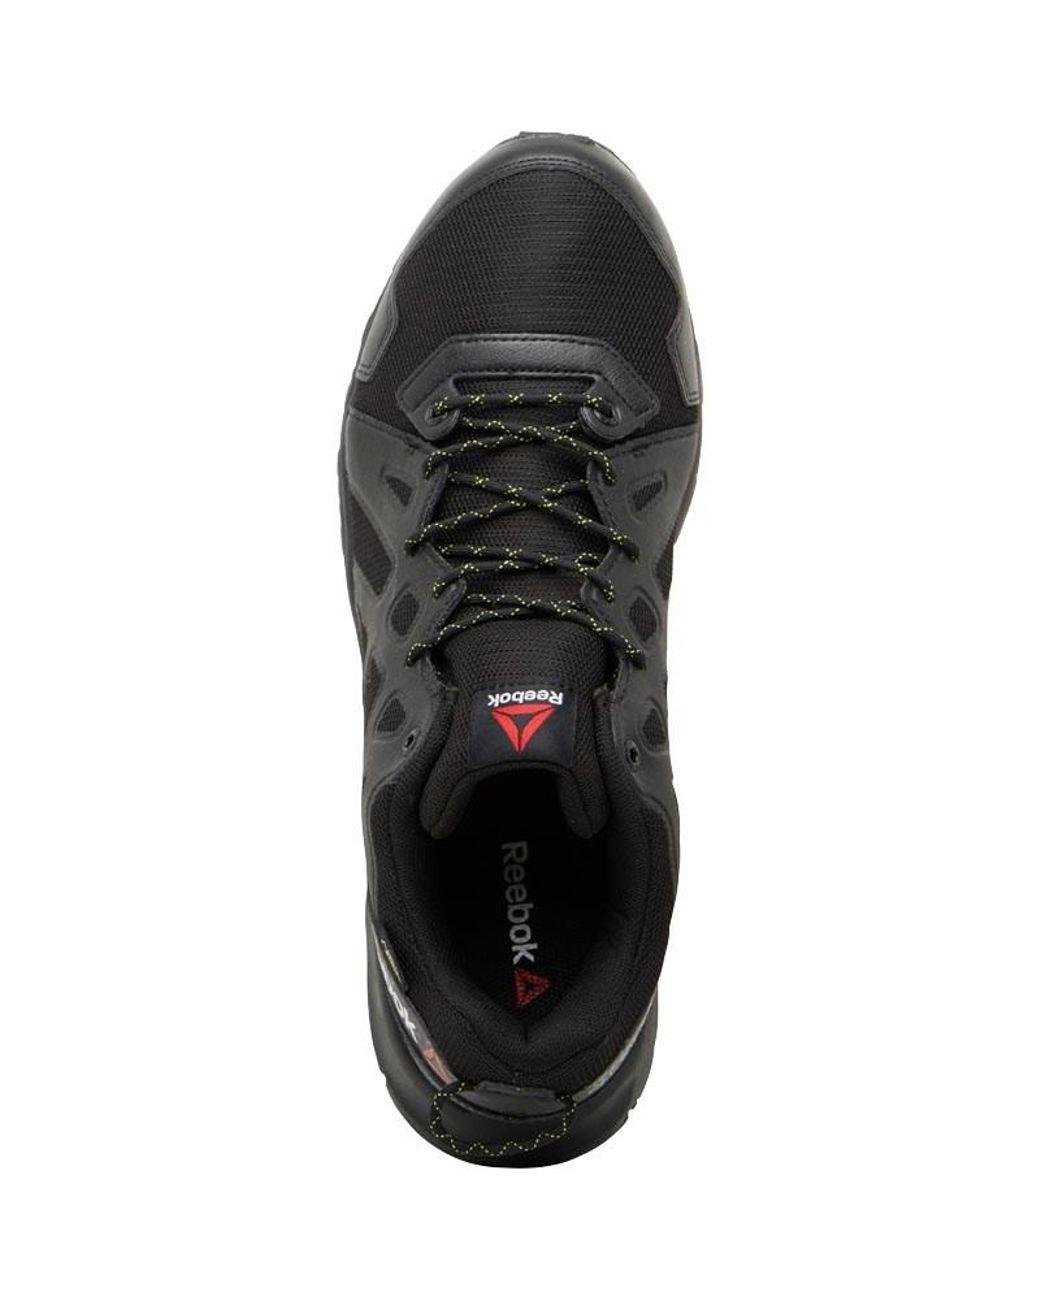 c5f8e8cc4 Reebok Les Mills Sawcut 4.0 Gore-tex Walking Shoes Black hero Yellow in  Black for Men - Save 21% - Lyst